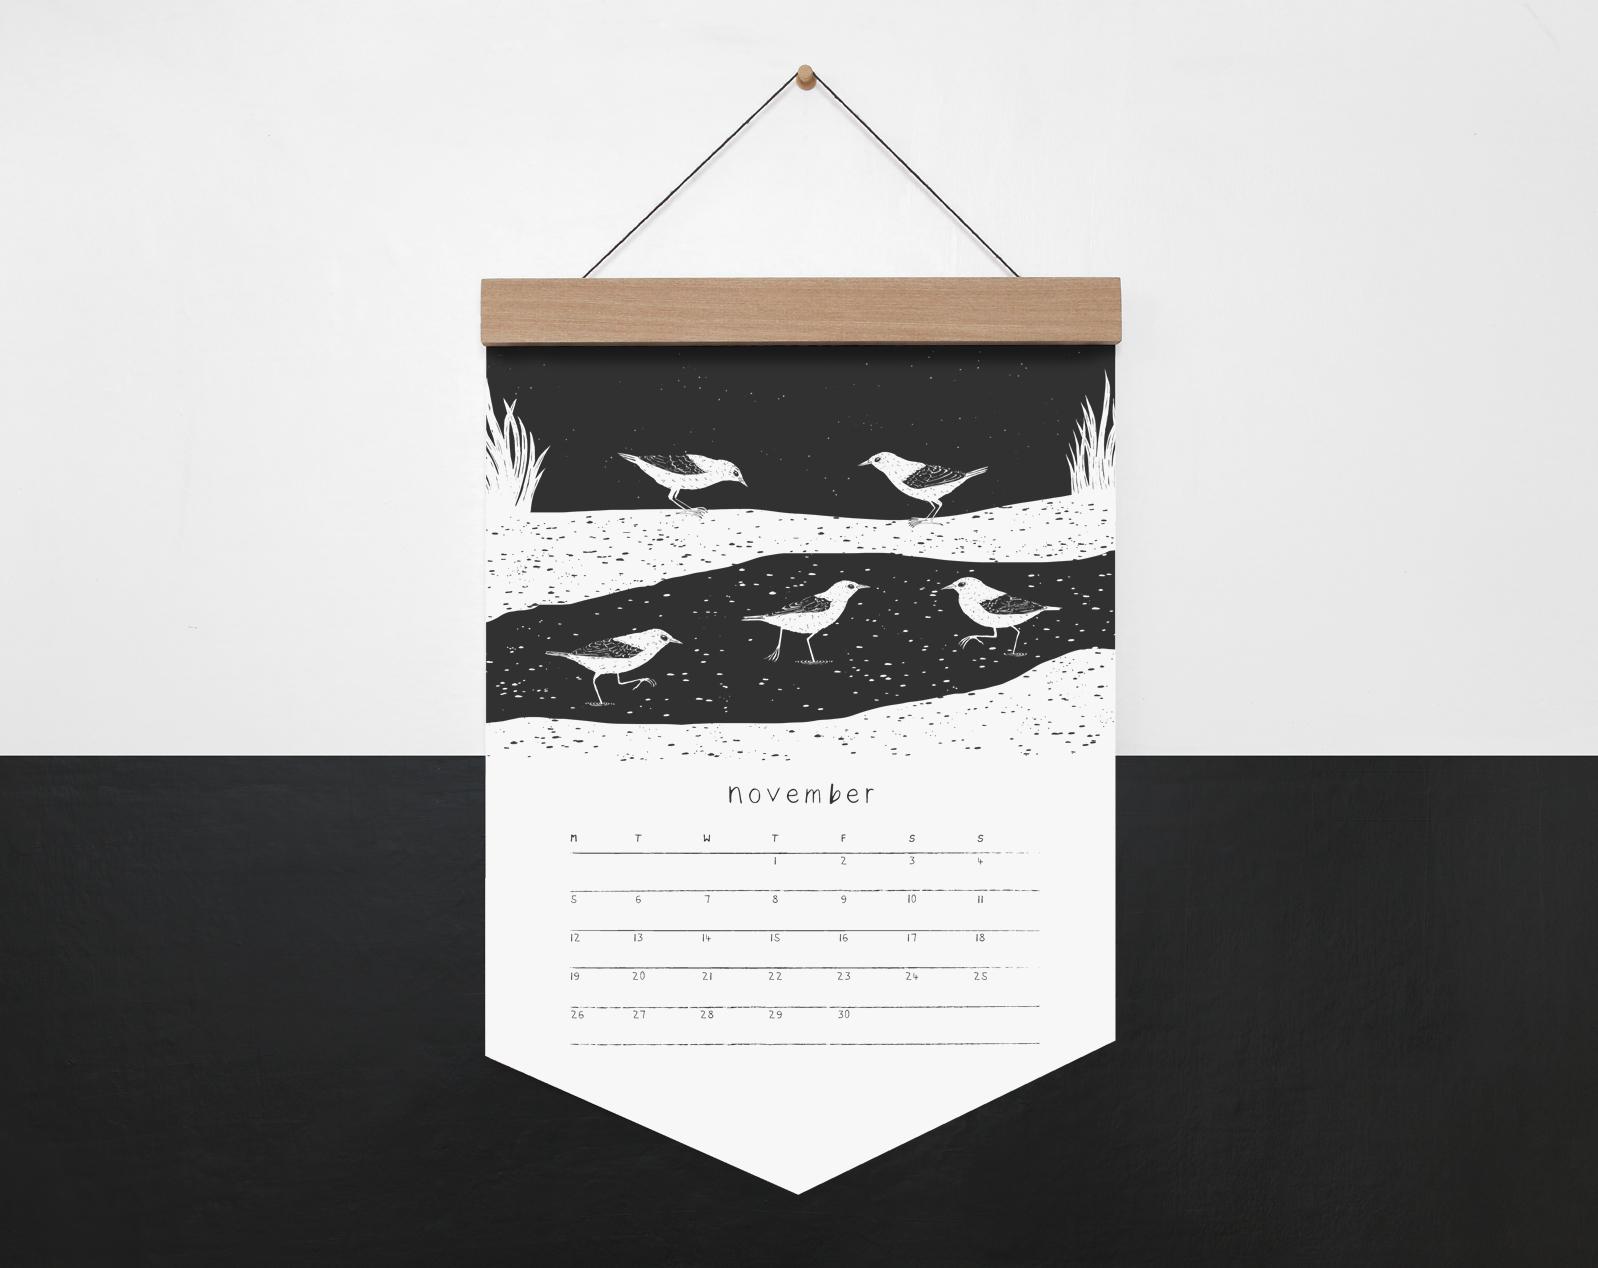 bird-plus-bird-a3-calendar-12.jpg